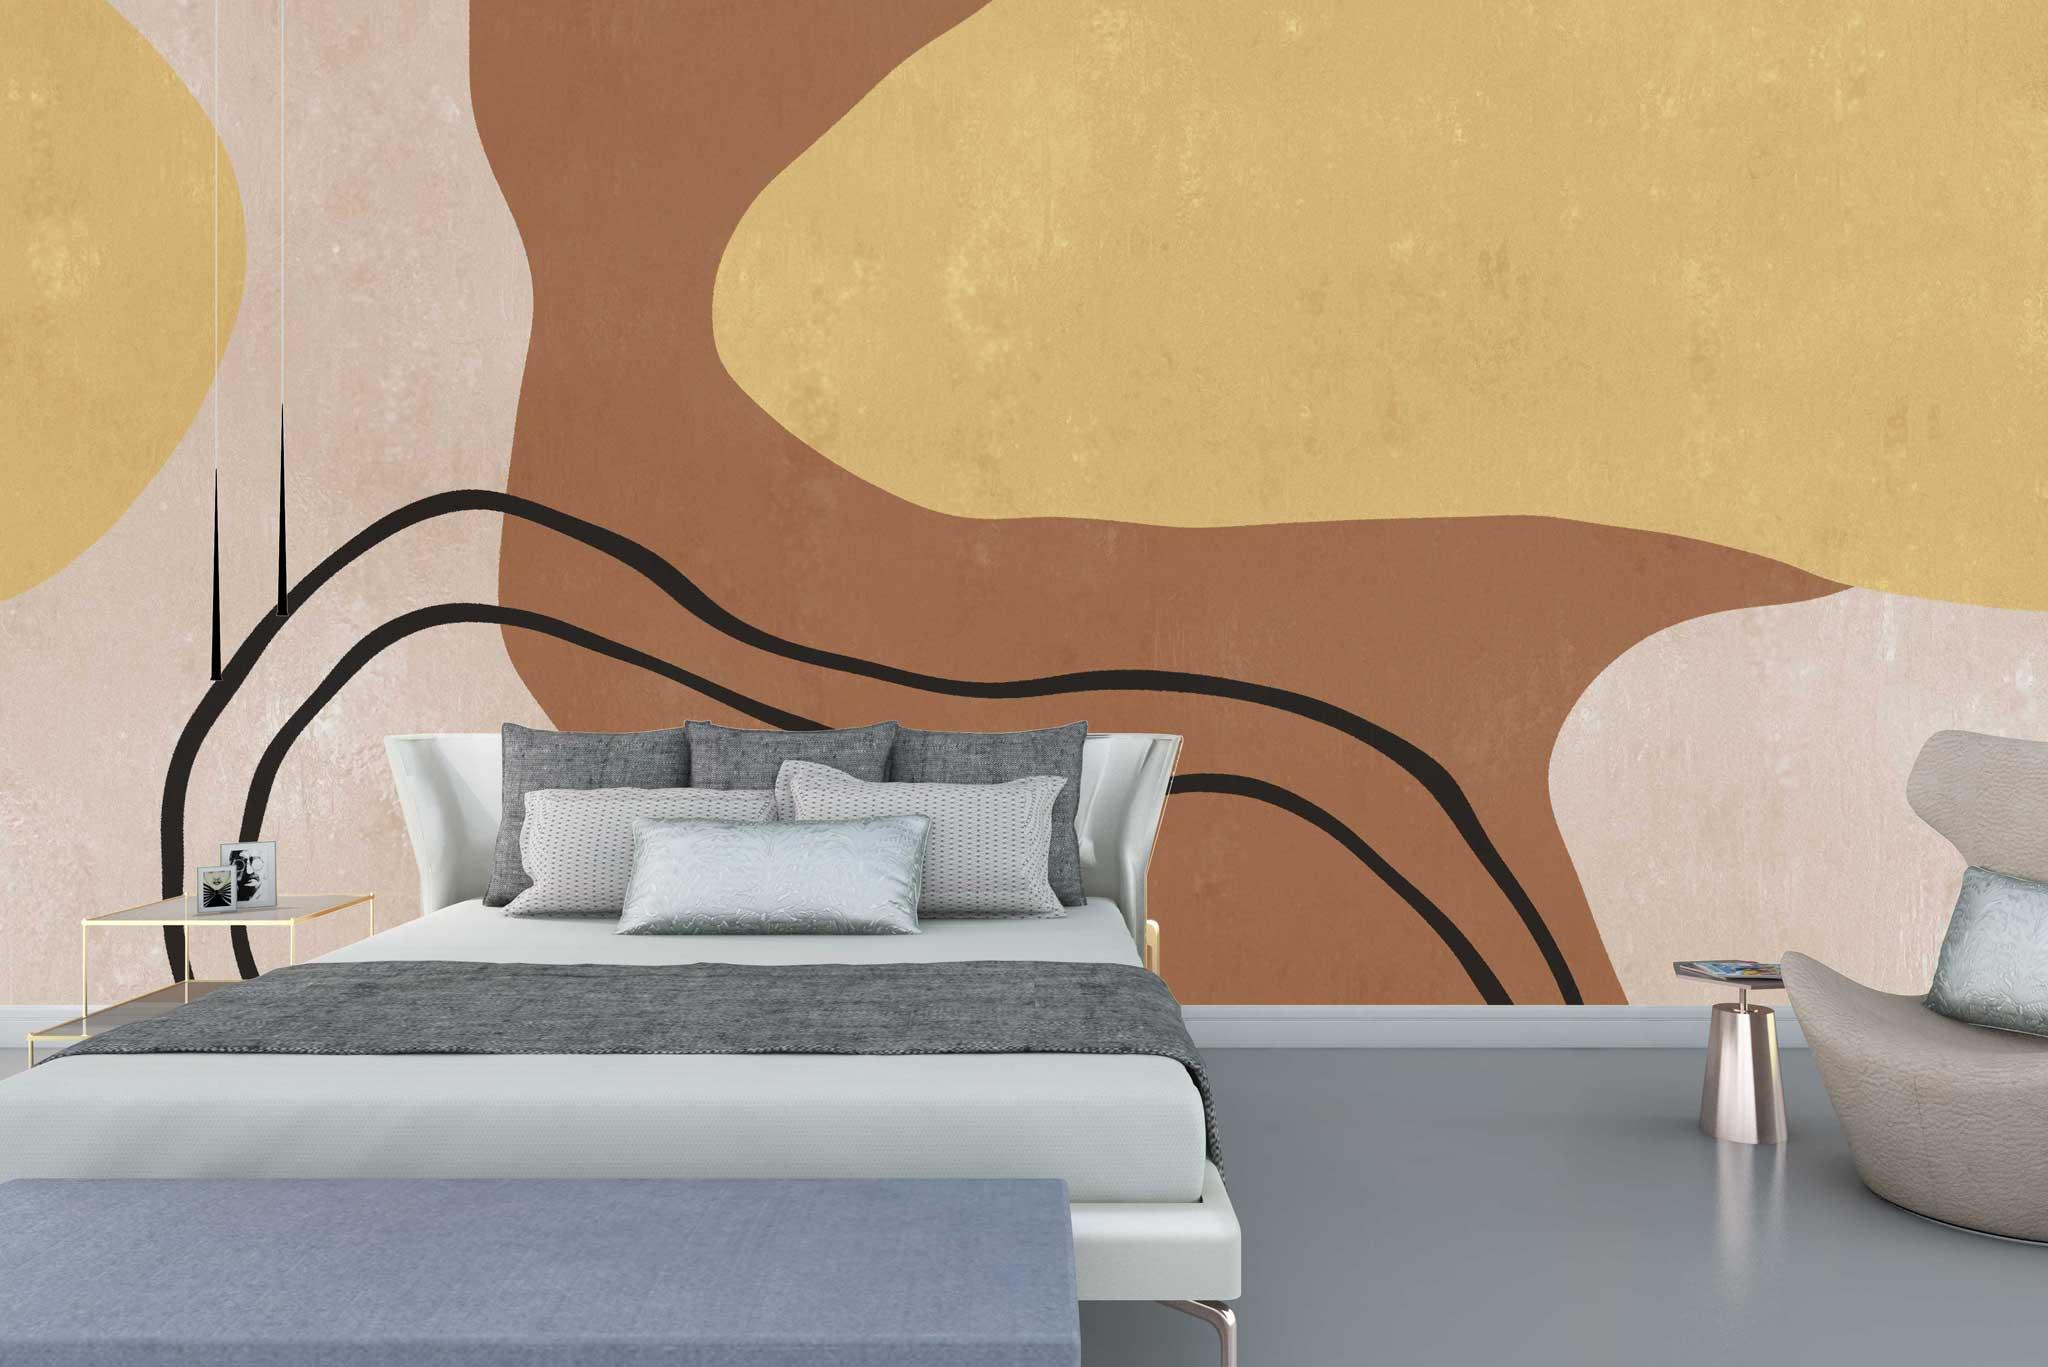 tapet-fototapet-comanda-personalizat-bucuresti-perete-special-lux-model-desen-grafic-abstract-bej-crem-auriu